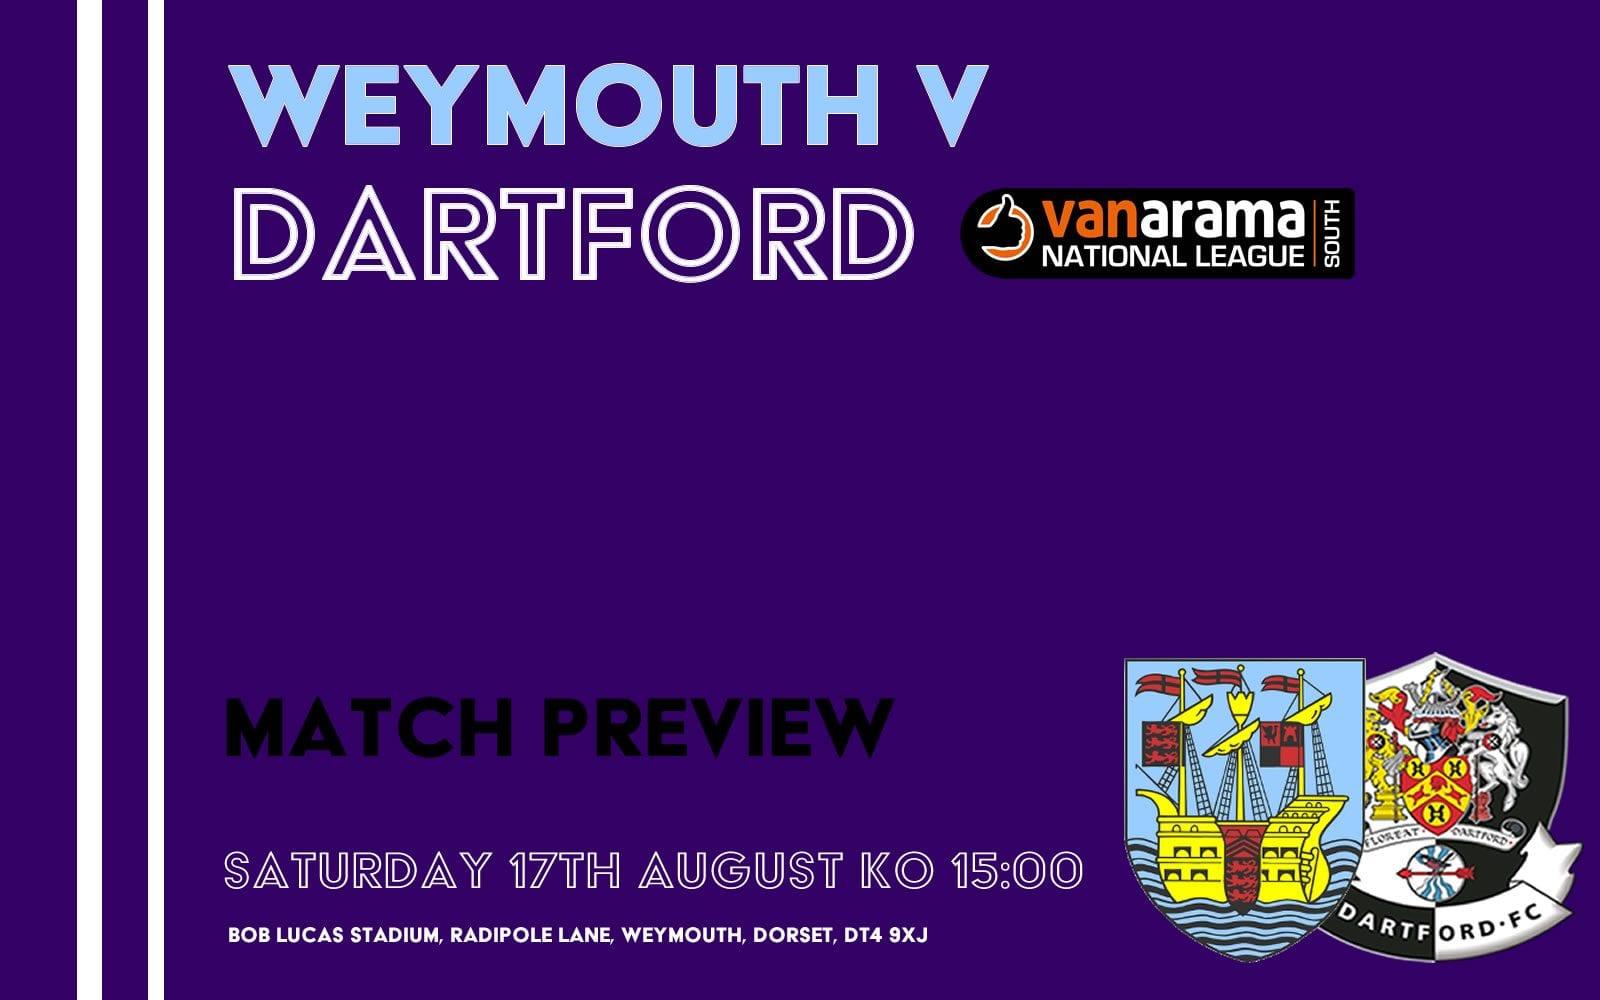 Match Preview – Weymouth v Dartford